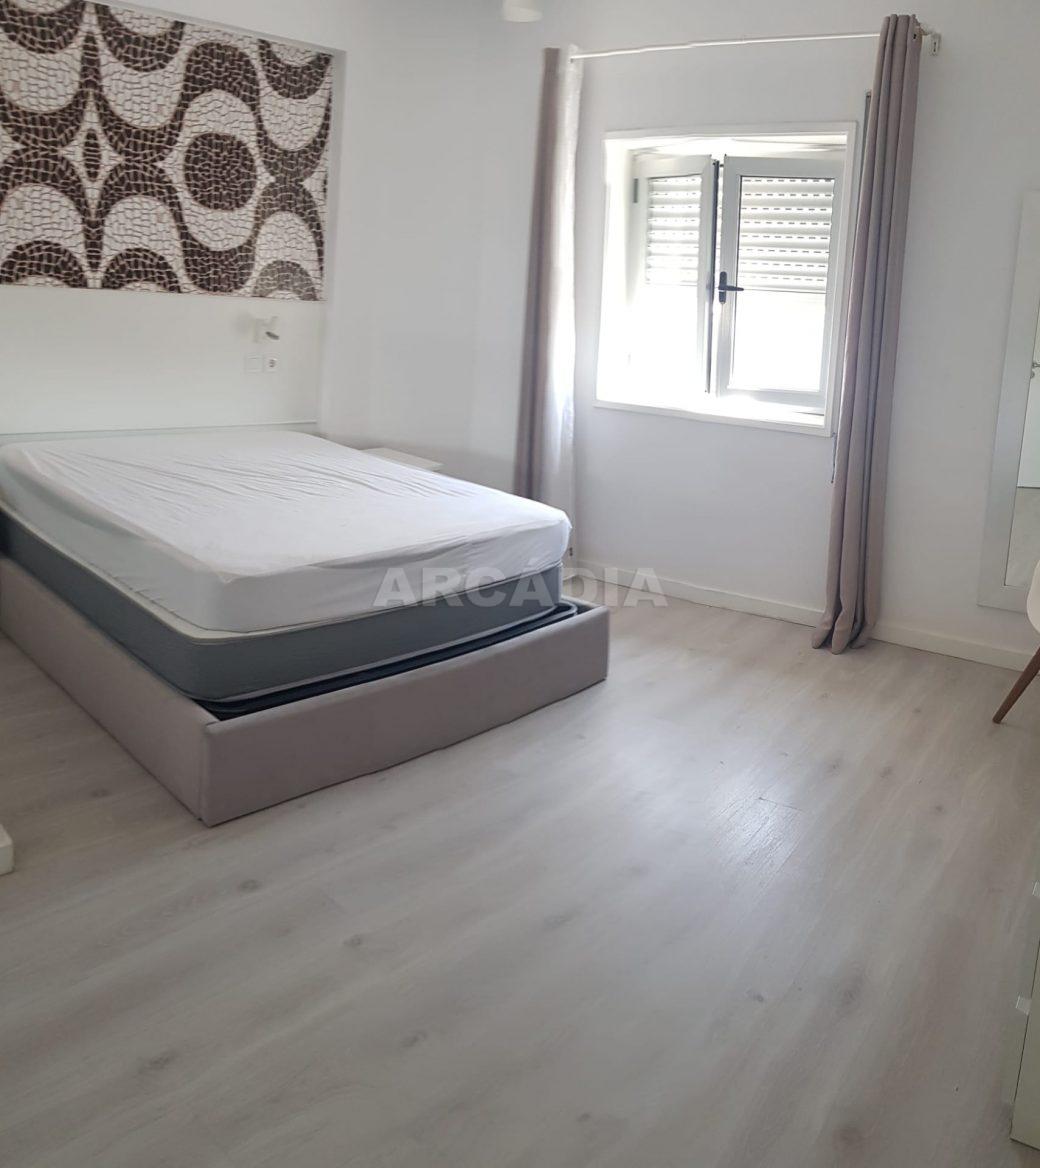 arcadia-imobiliaria-braga-apartamento-para-venda-excelente-negocio-todo-remodelado-em-braga-sao-vitor-34